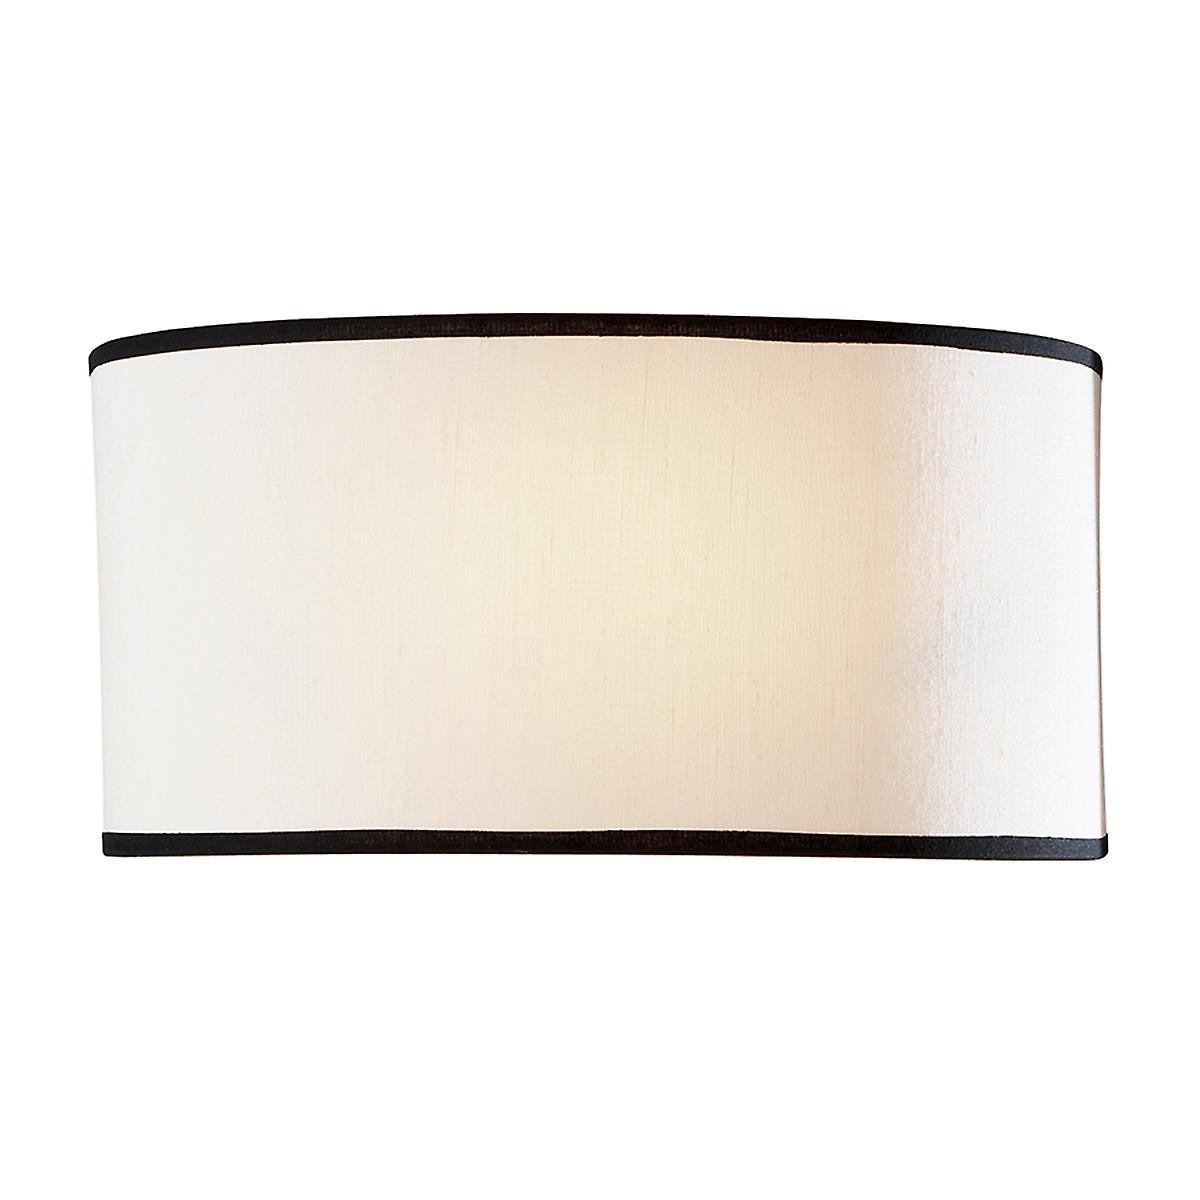 David Hunt ASC0733 Ascott Single Wall Light With A Cream S018 Shade